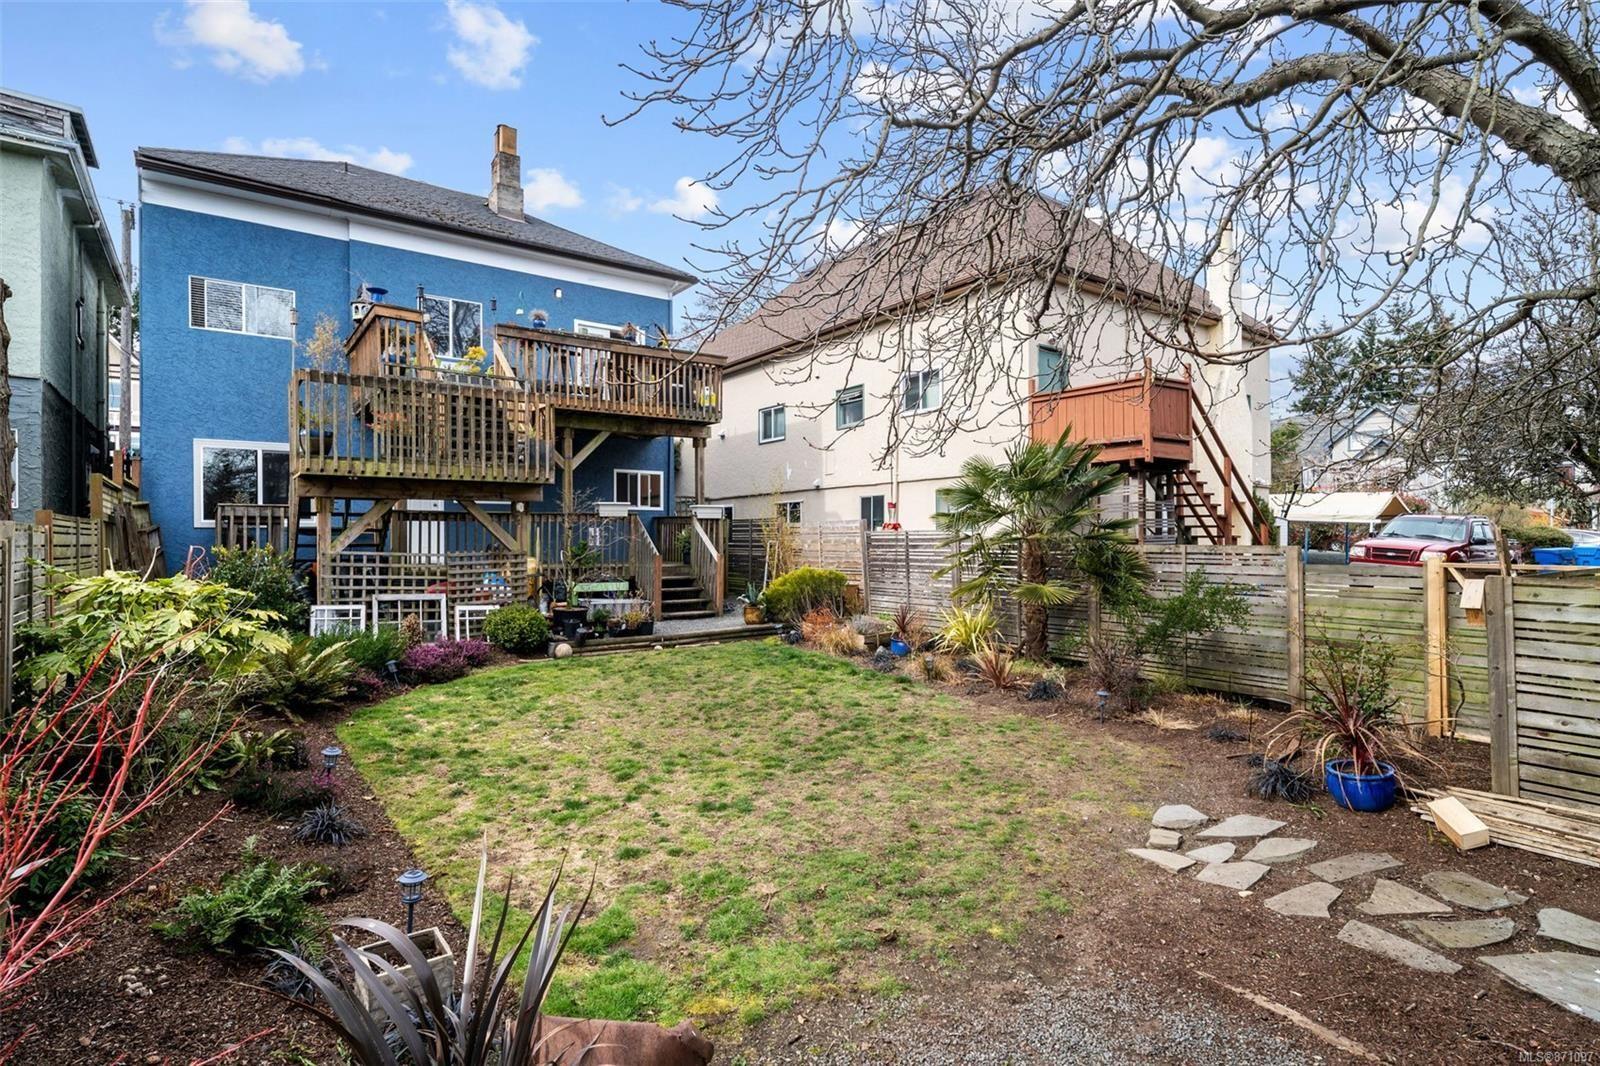 Main Photo: 1713/1715 Fernwood Rd in : Vi Fernwood House for sale (Victoria)  : MLS®# 871097